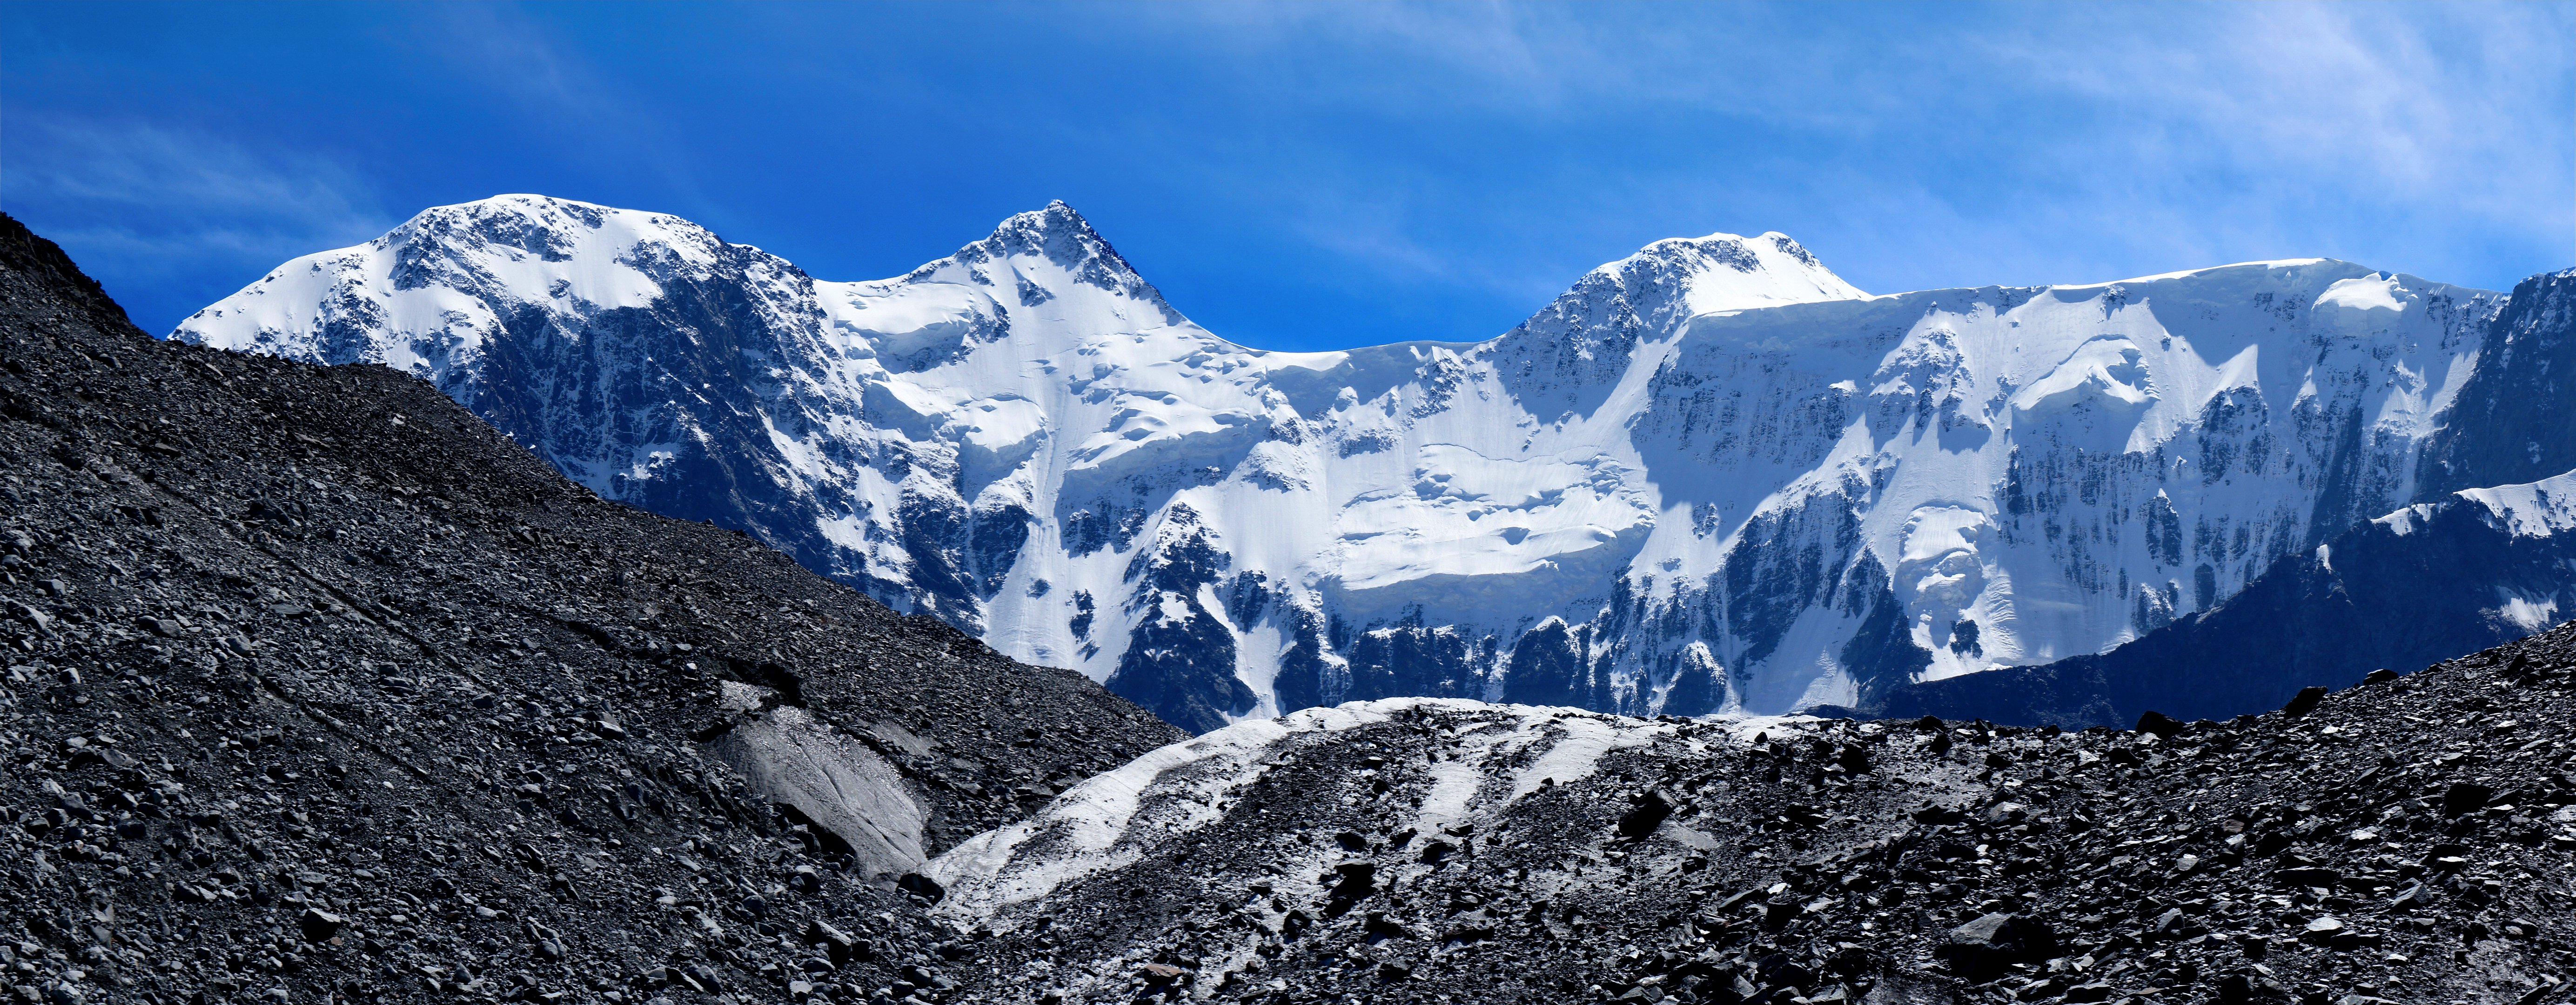 Panorama dual monitor mountain snow wallpaper